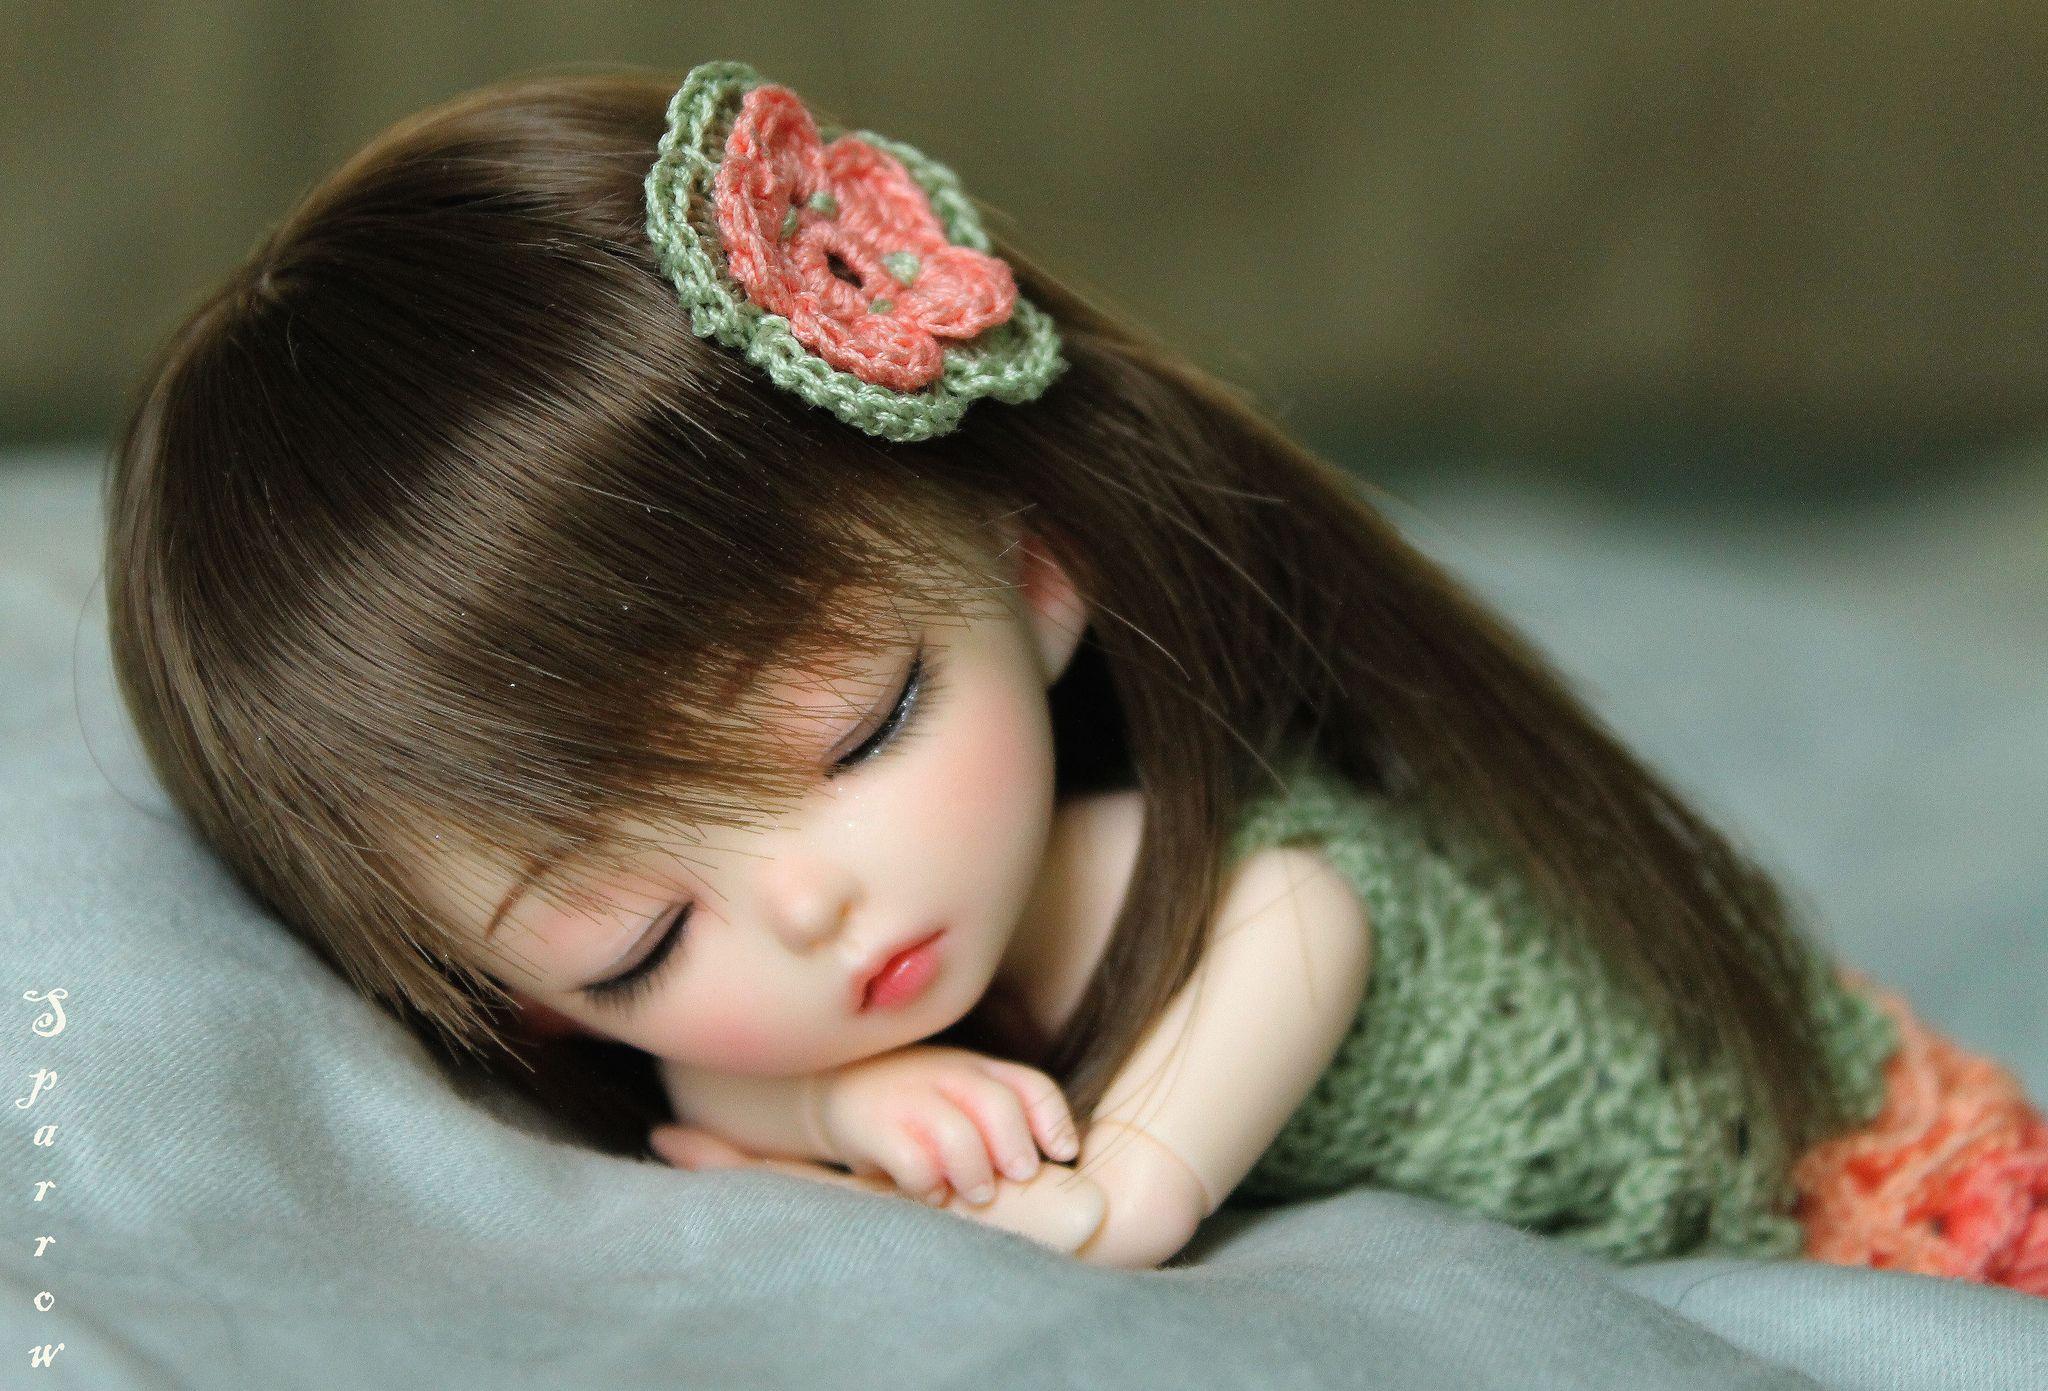 Nell Cute Dolls Cute Baby Dolls Cute Girl Hd Wallpaper Cute doll cute barbie dolls desktop